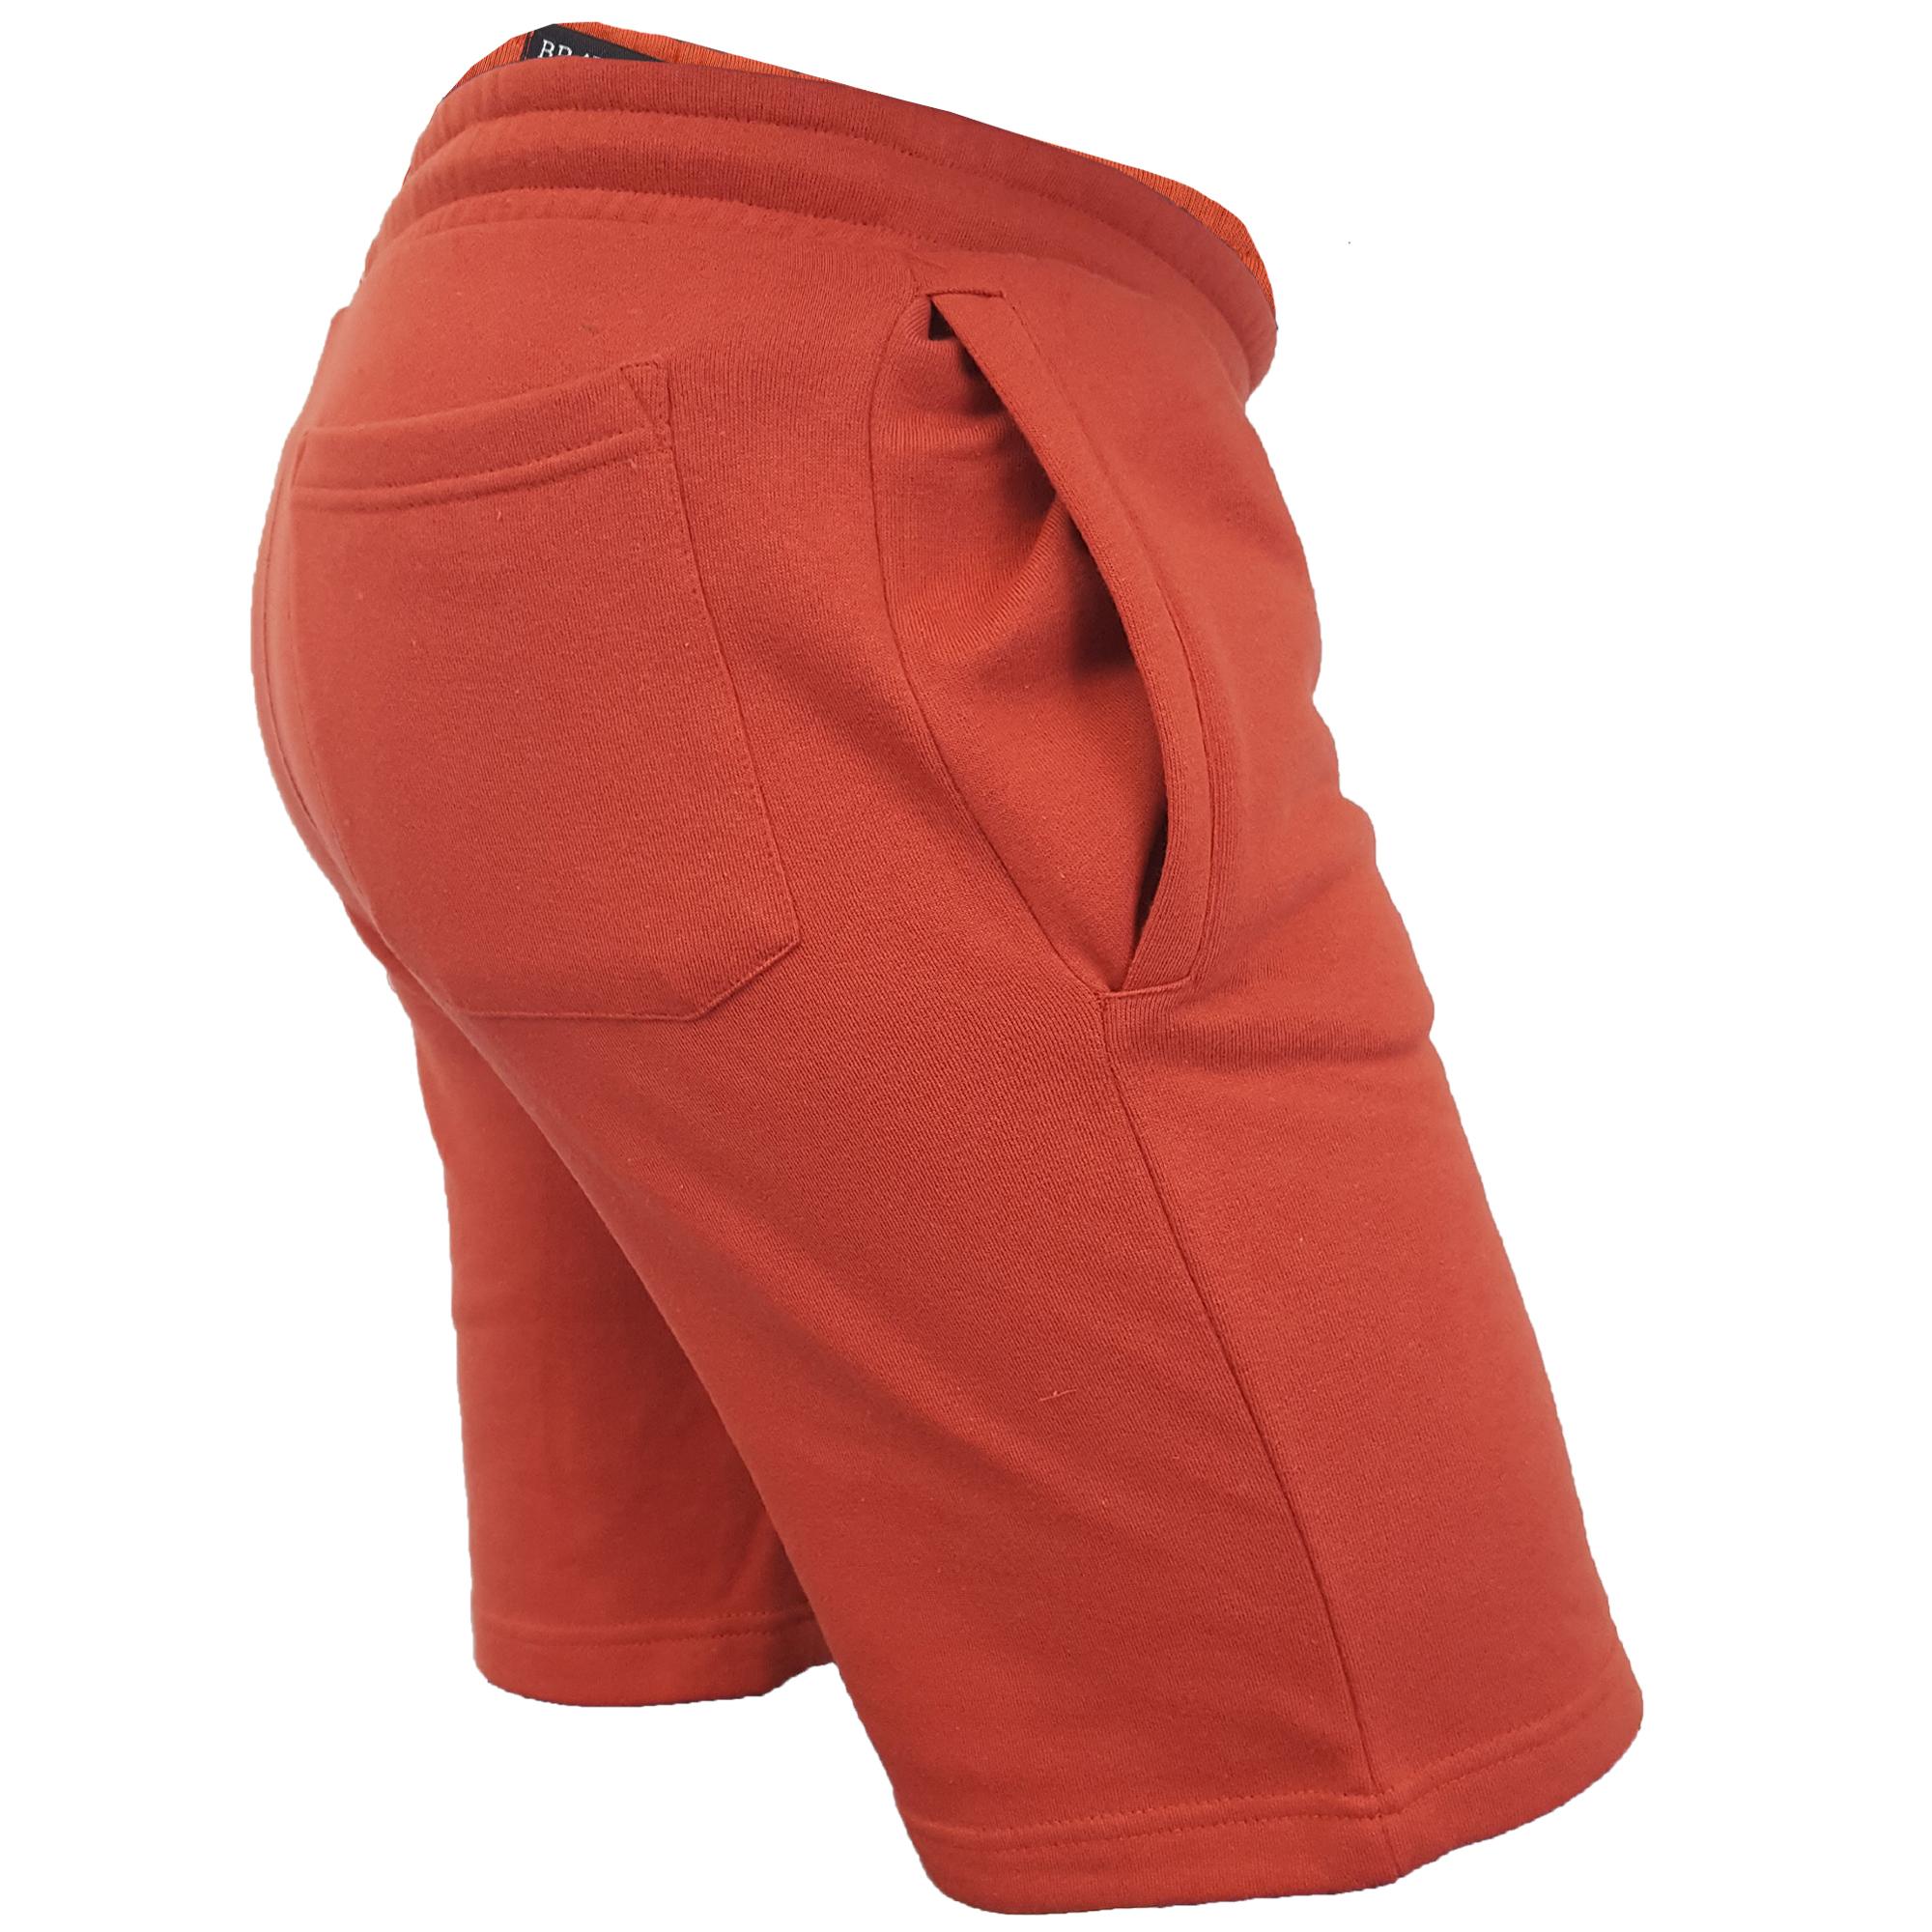 Mens-Jogger-Shorts-Tarley-by-Brave-Soul-Knee-Length-Casual-Fleece-Lined-Summer thumbnail 42